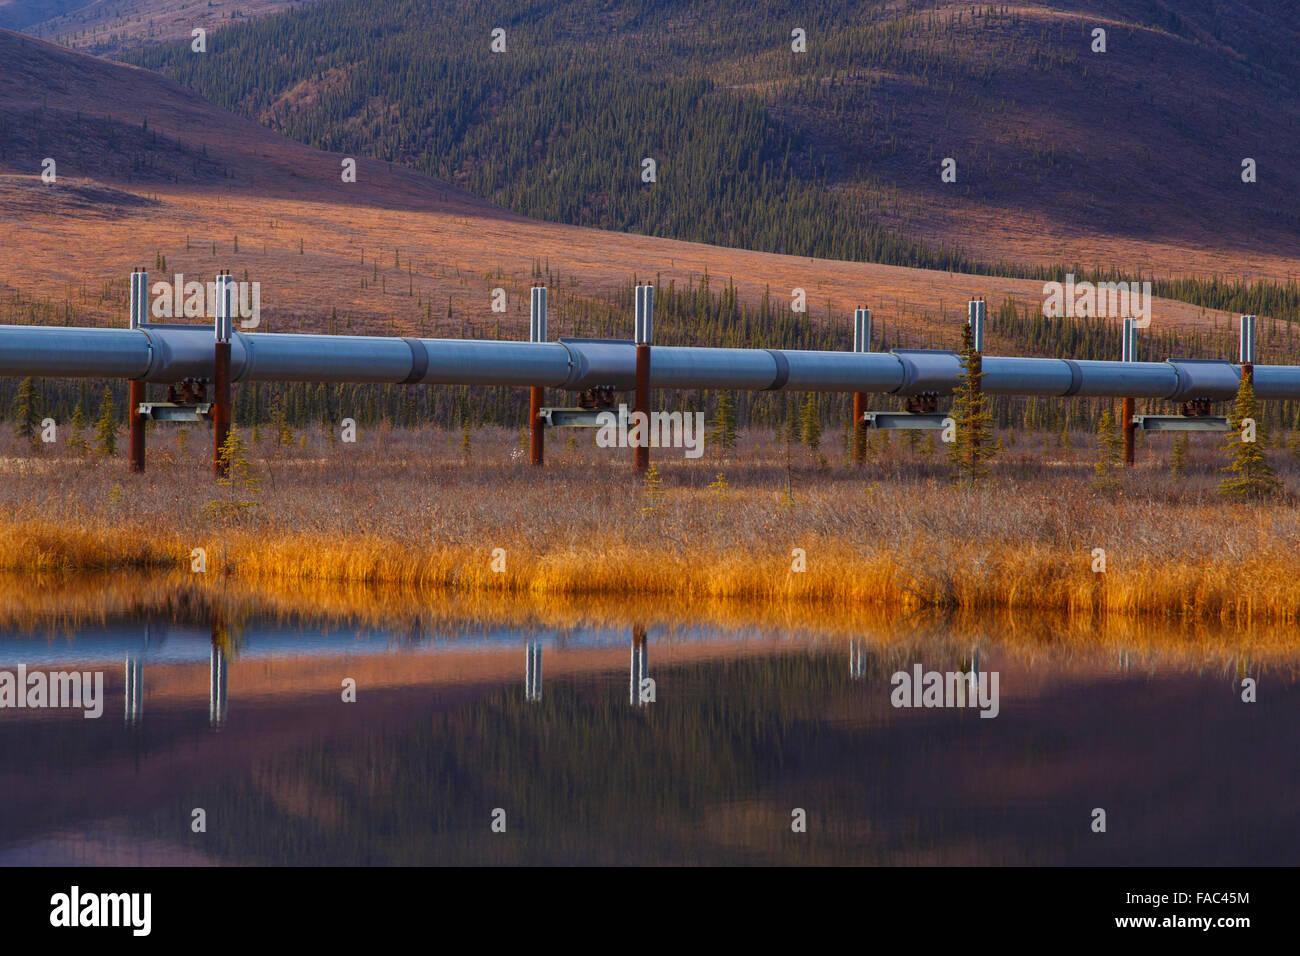 Alyeska Pipeline from the Dalton Highway, Alaska. - Stock Image